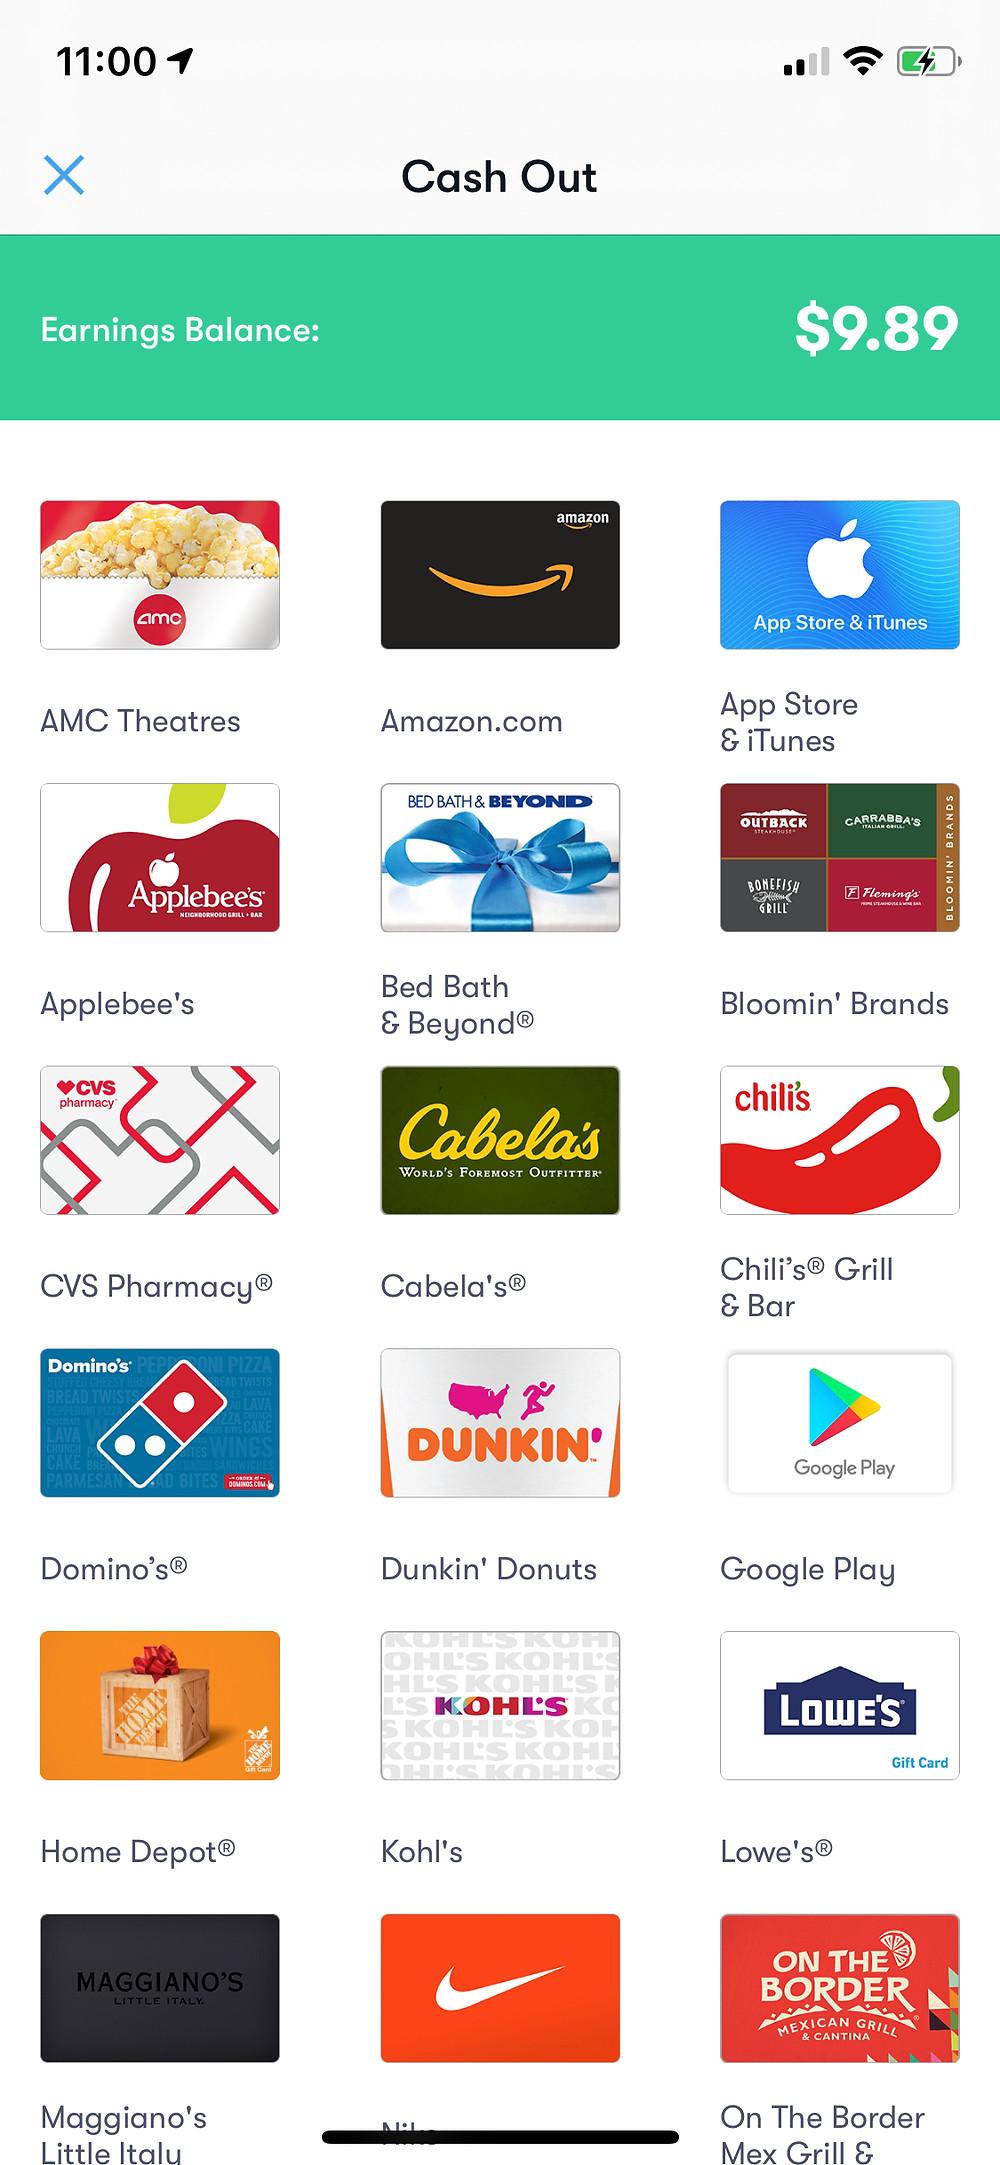 GetUpside App showing Cash out options